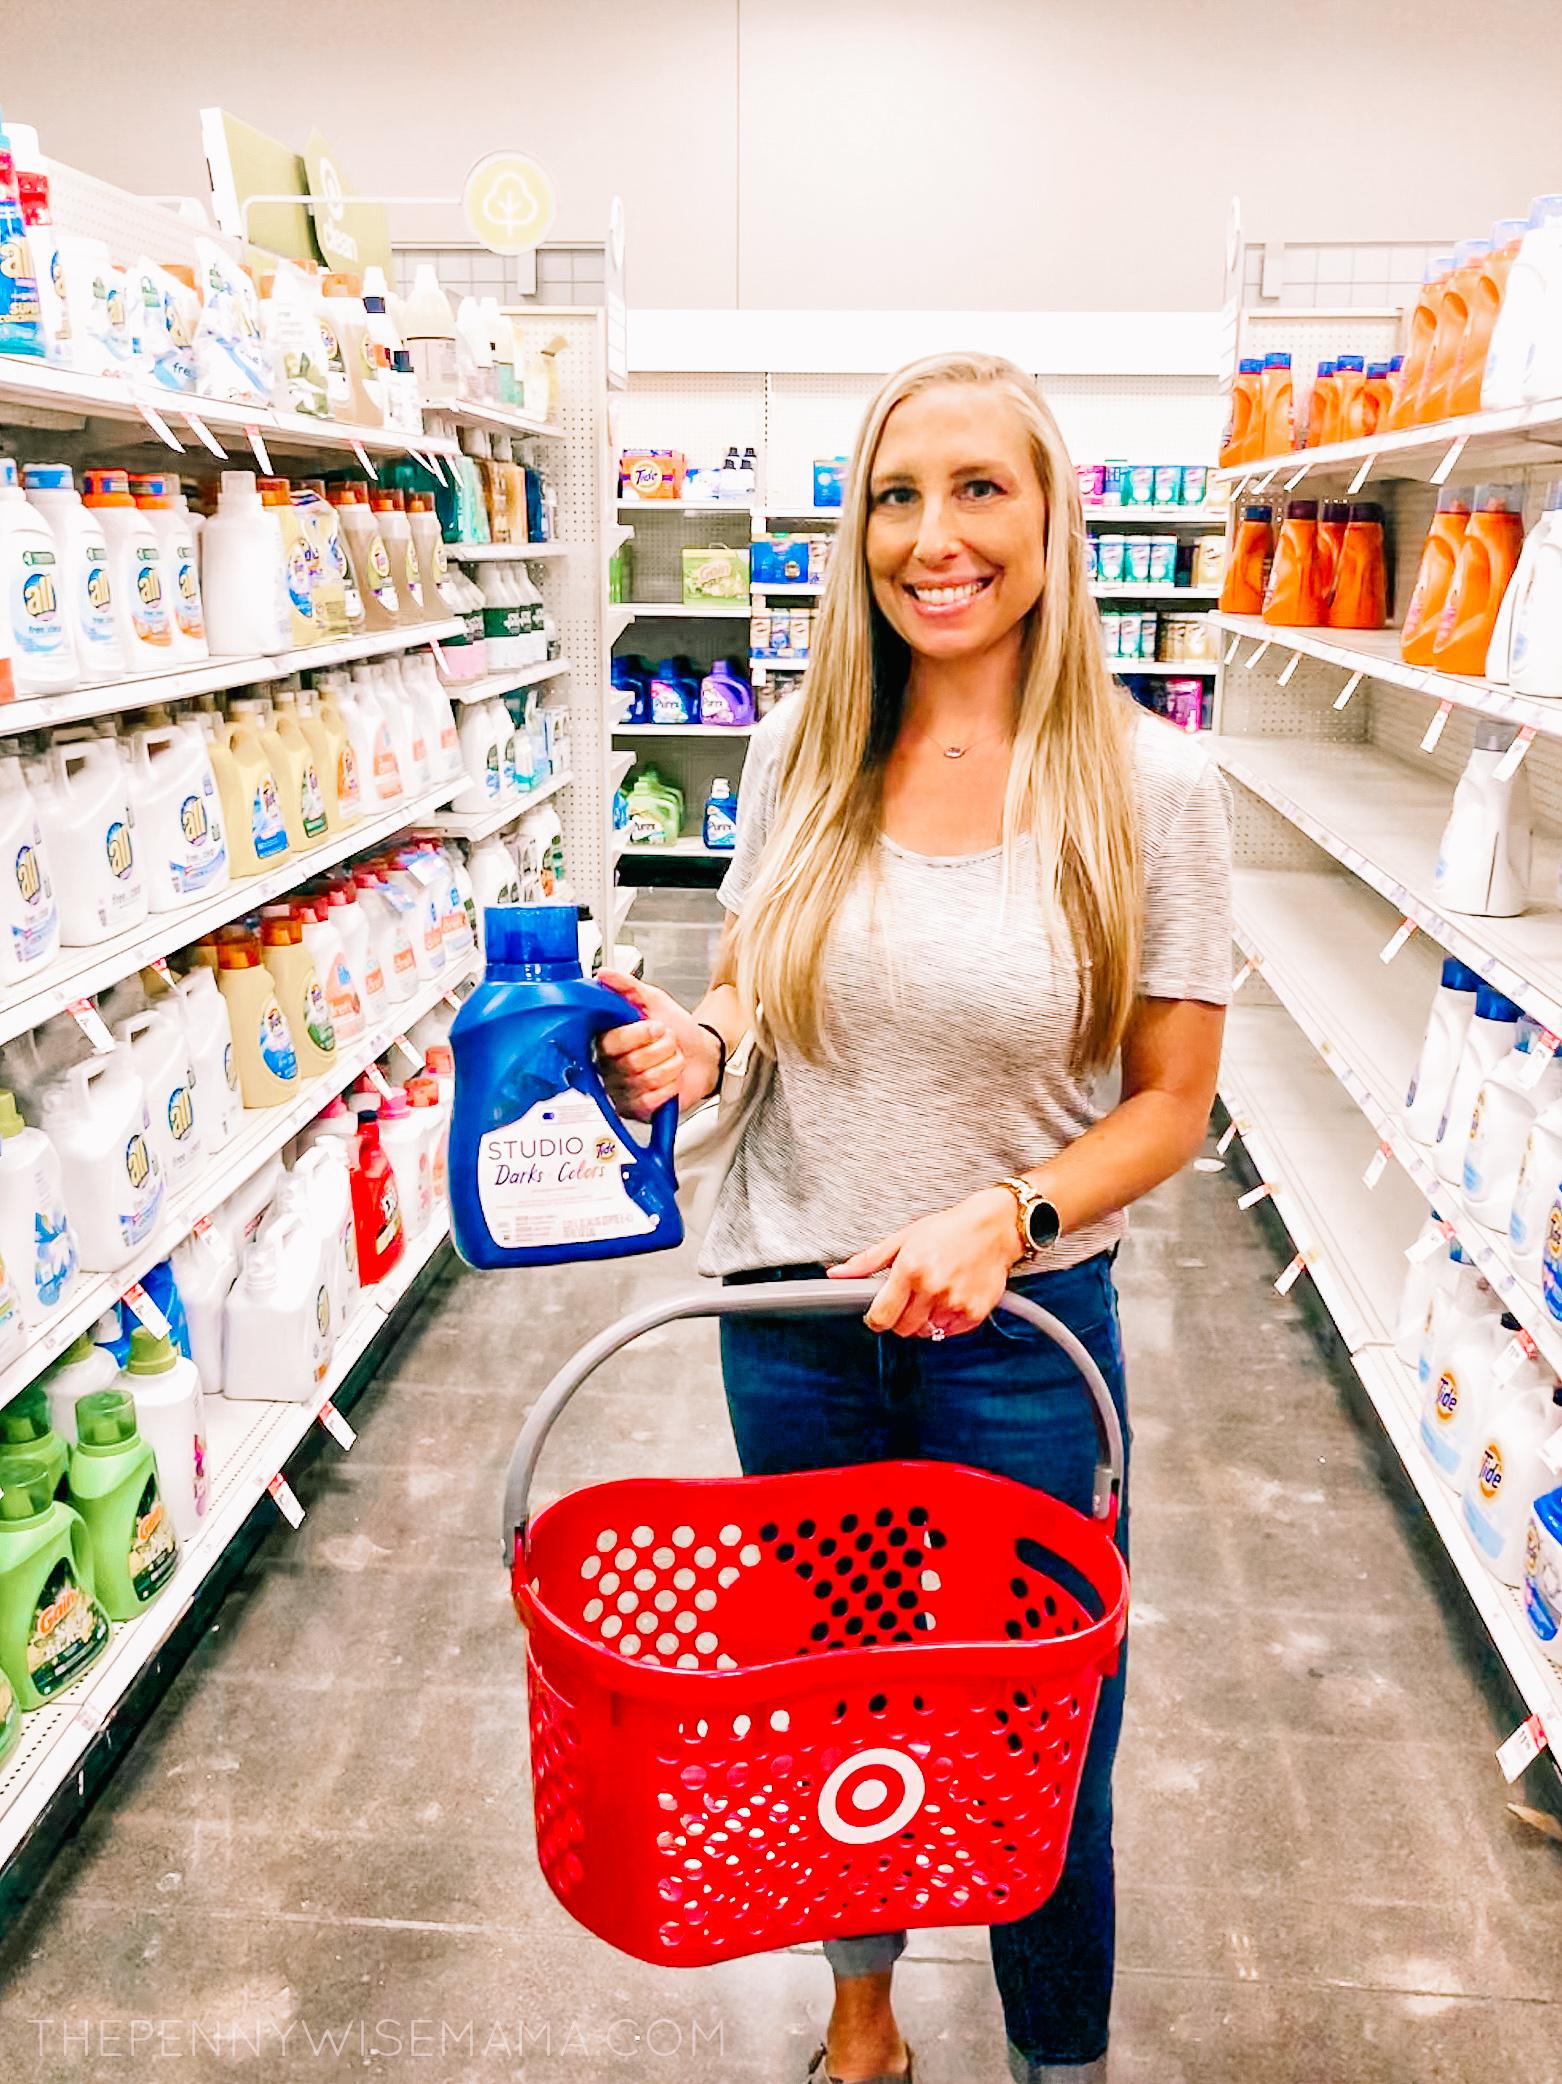 NEW Tide Studio Darks & Colors Laundry Detergent at Target